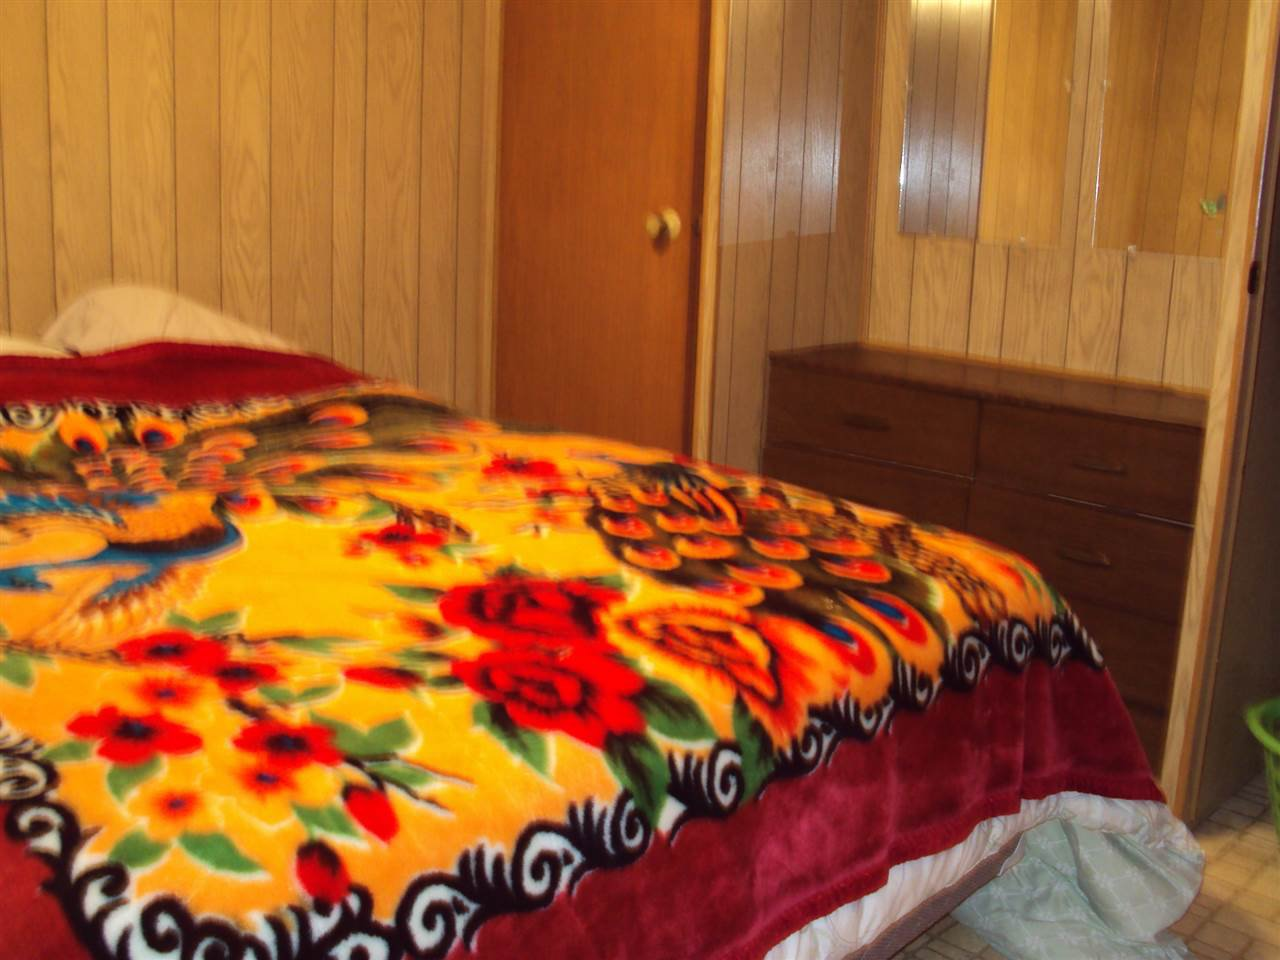 Photo 4: Photos: 59 3001 N MACKENZIE Avenue in Williams Lake: Williams Lake - City Manufactured Home for sale (Williams Lake (Zone 27))  : MLS®# R2424679